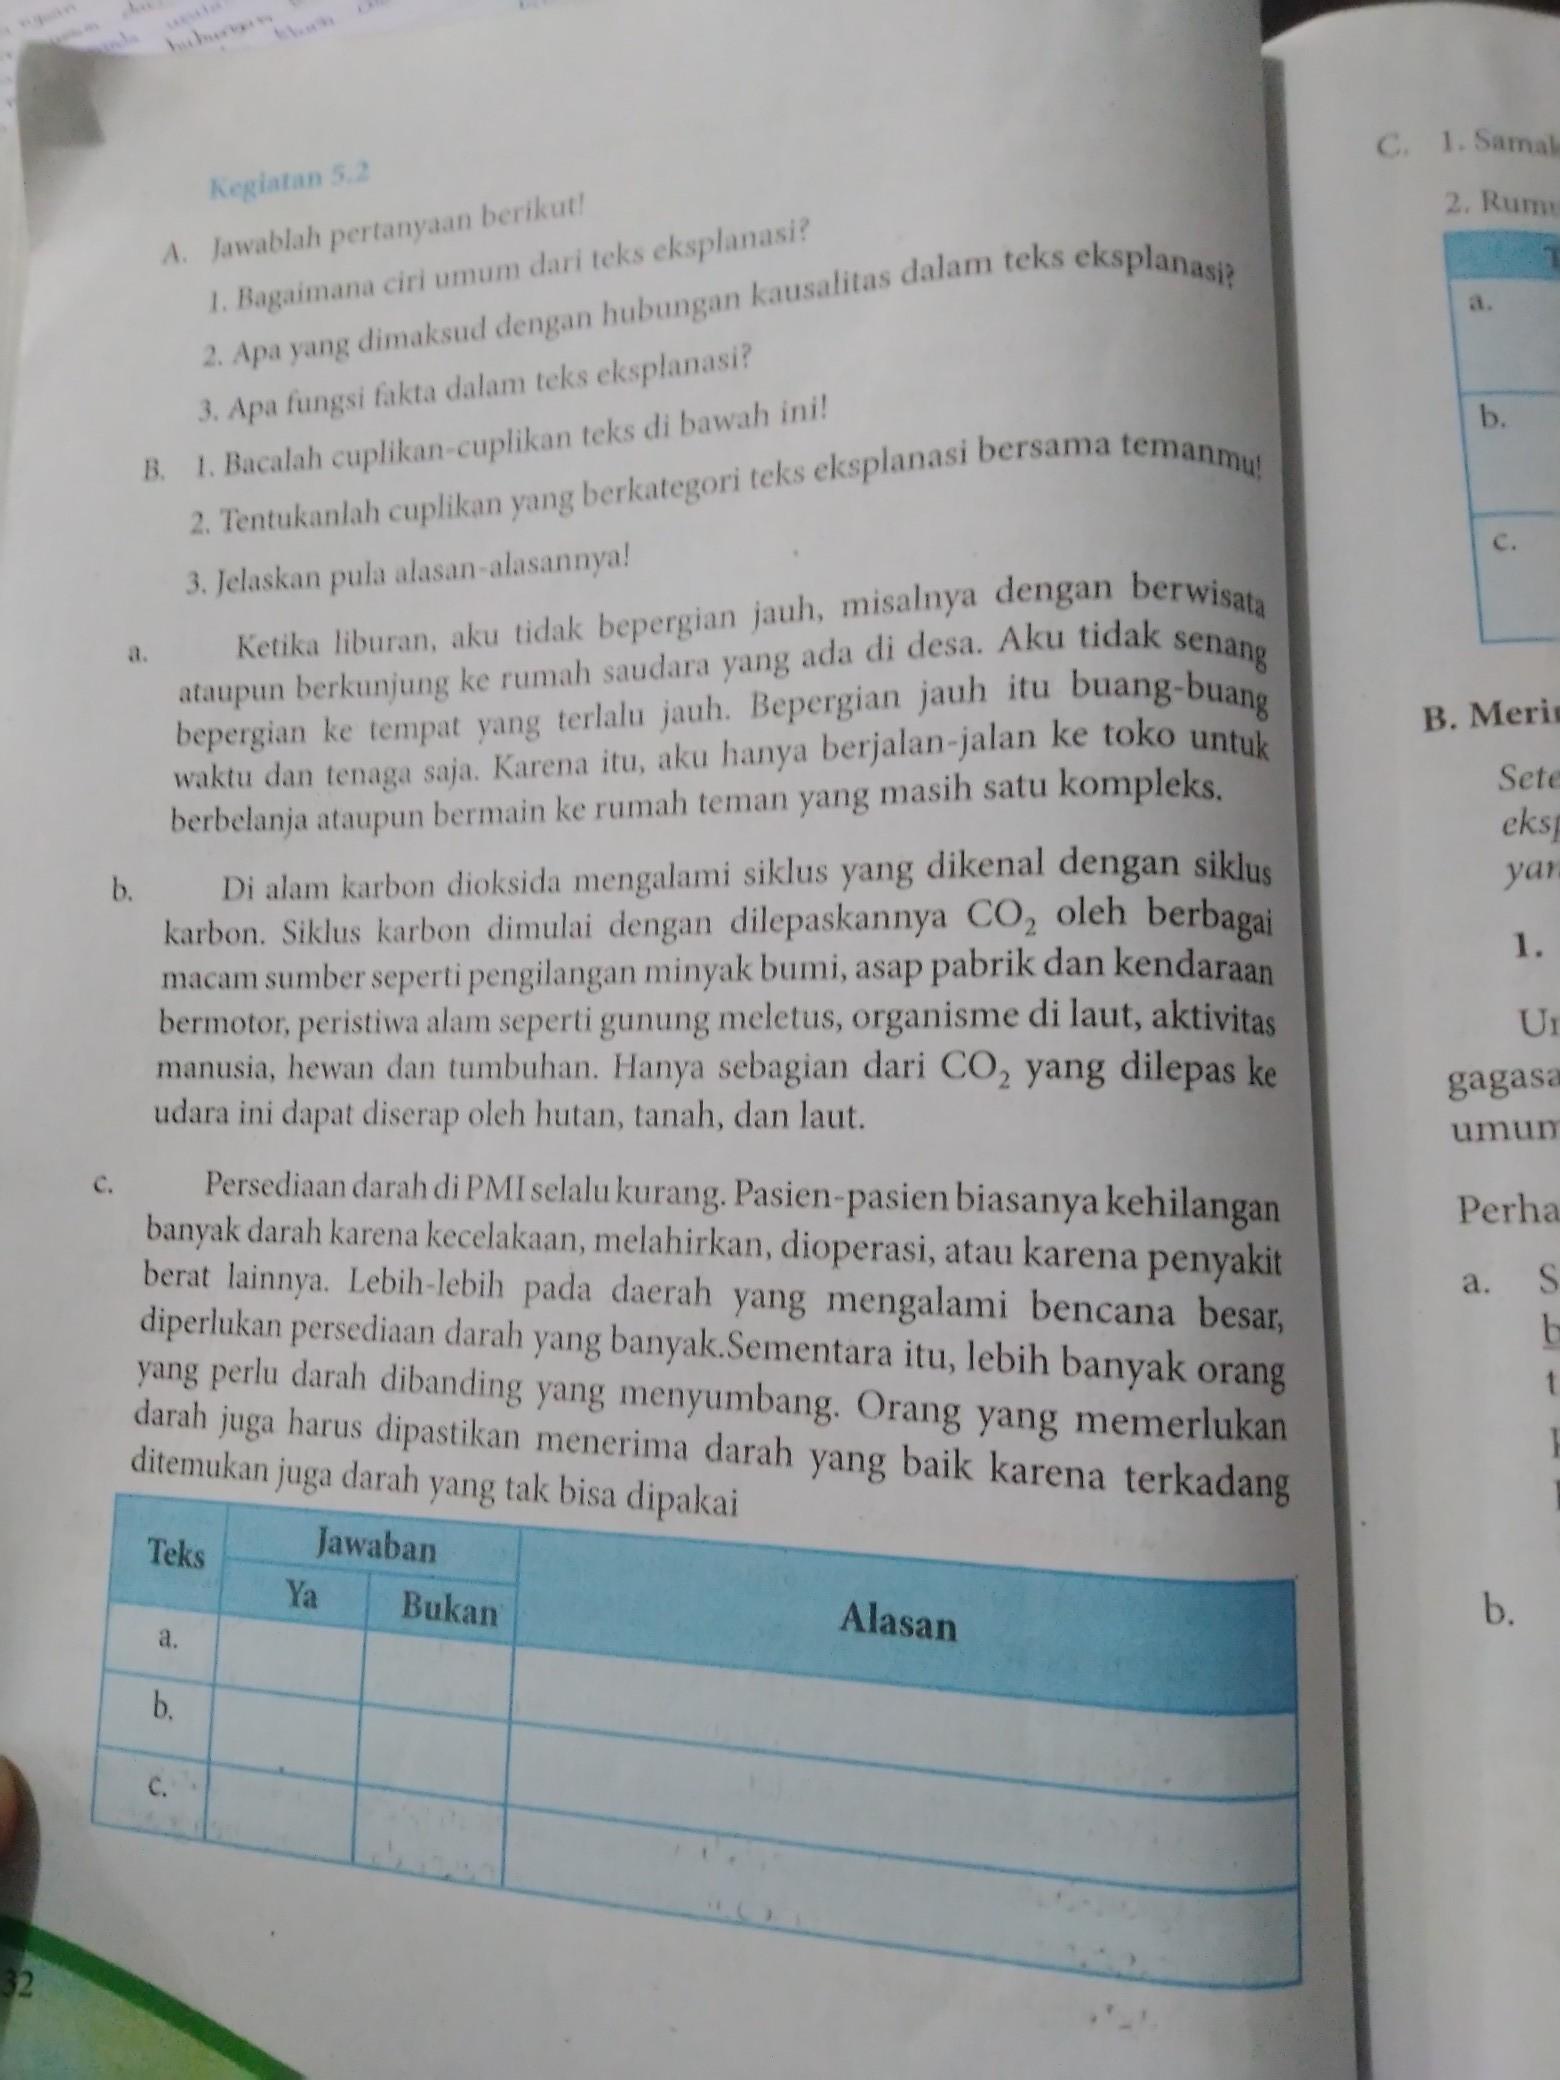 Kegiatan 5 2 Bahasa Indonesia Brainly Co Id